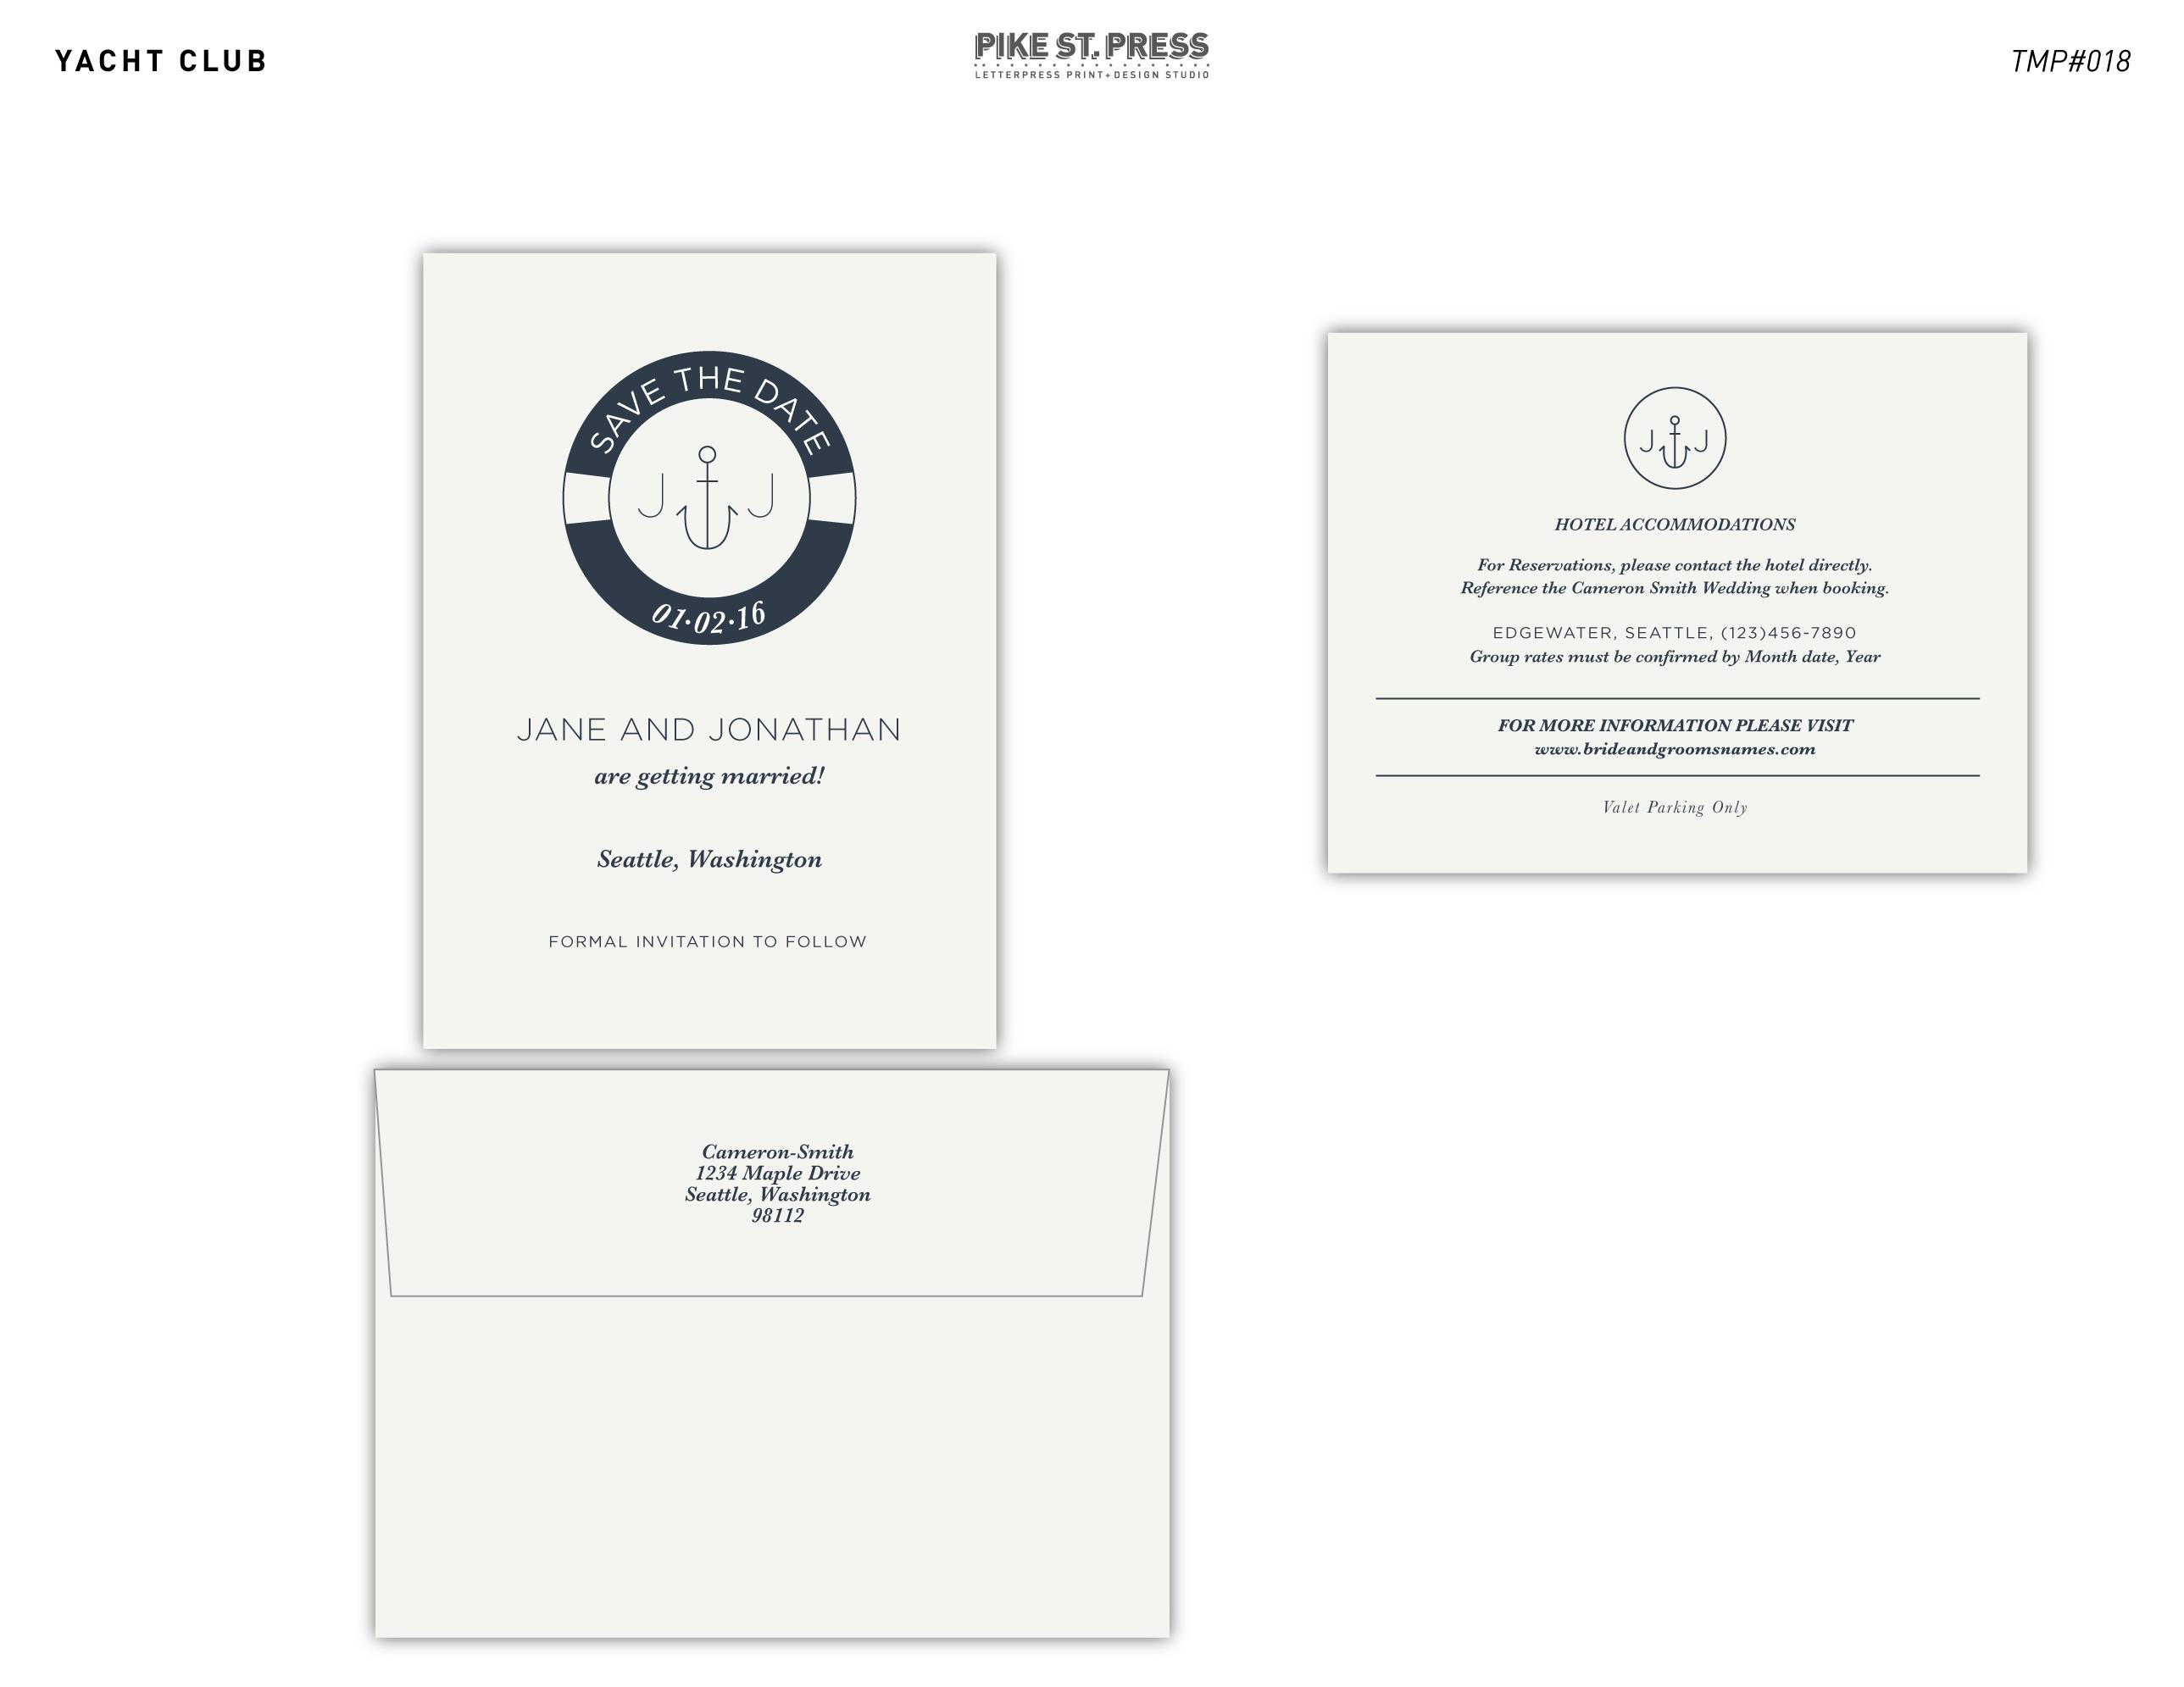 Yacht Club TMP018 – Wedding Invitation – Pike Street Press